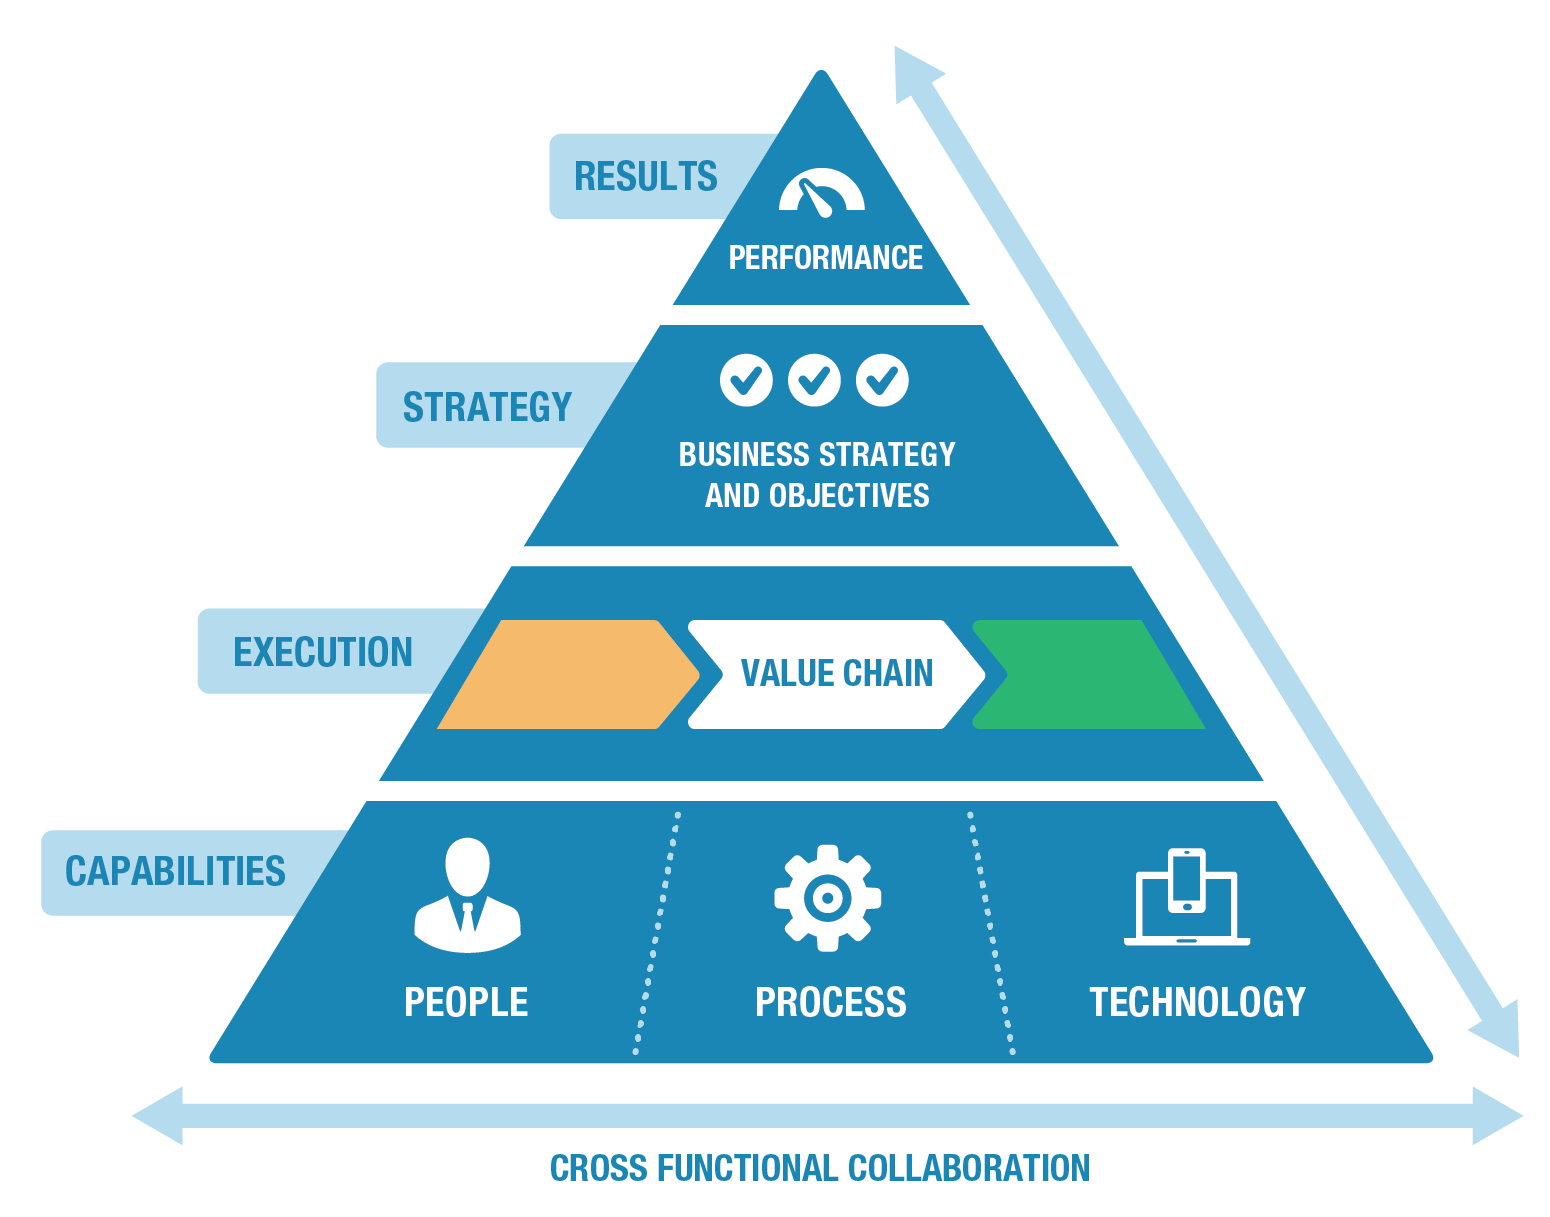 Cross Functional Collaboration Pyramid